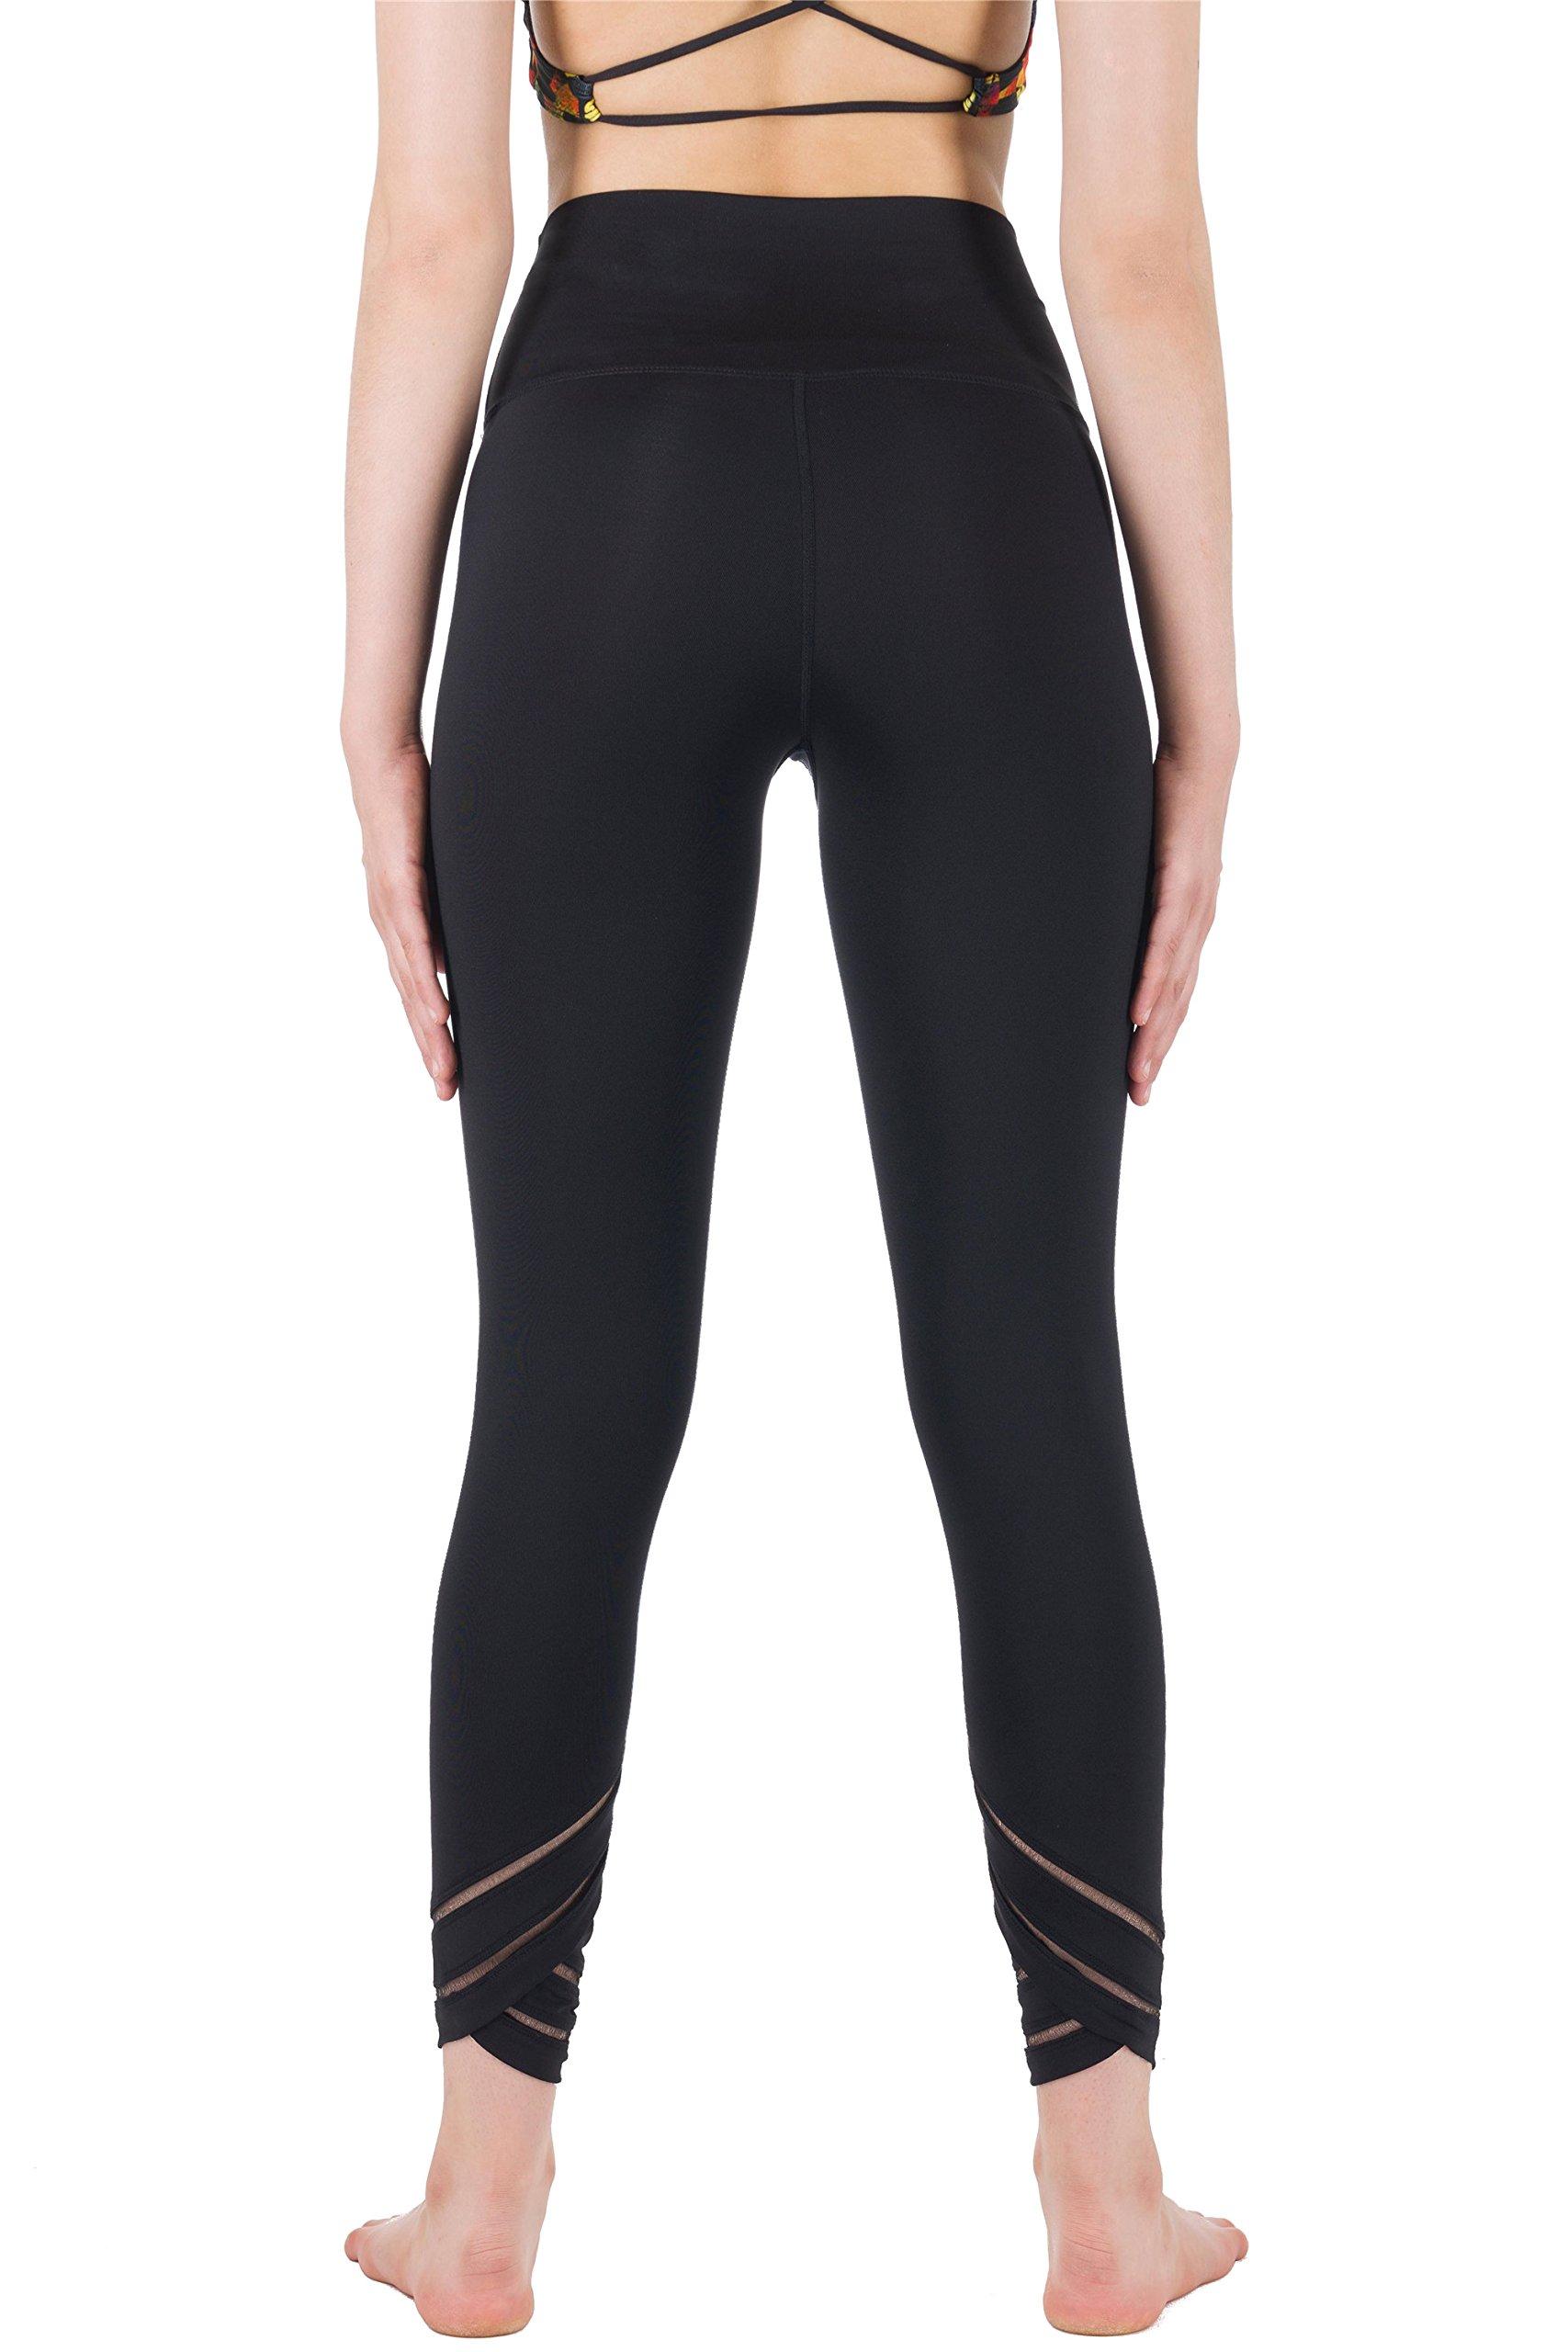 icyzone Womens Capri Workout Pants Yoga Pants Active Running Leggings (L, BLACK)